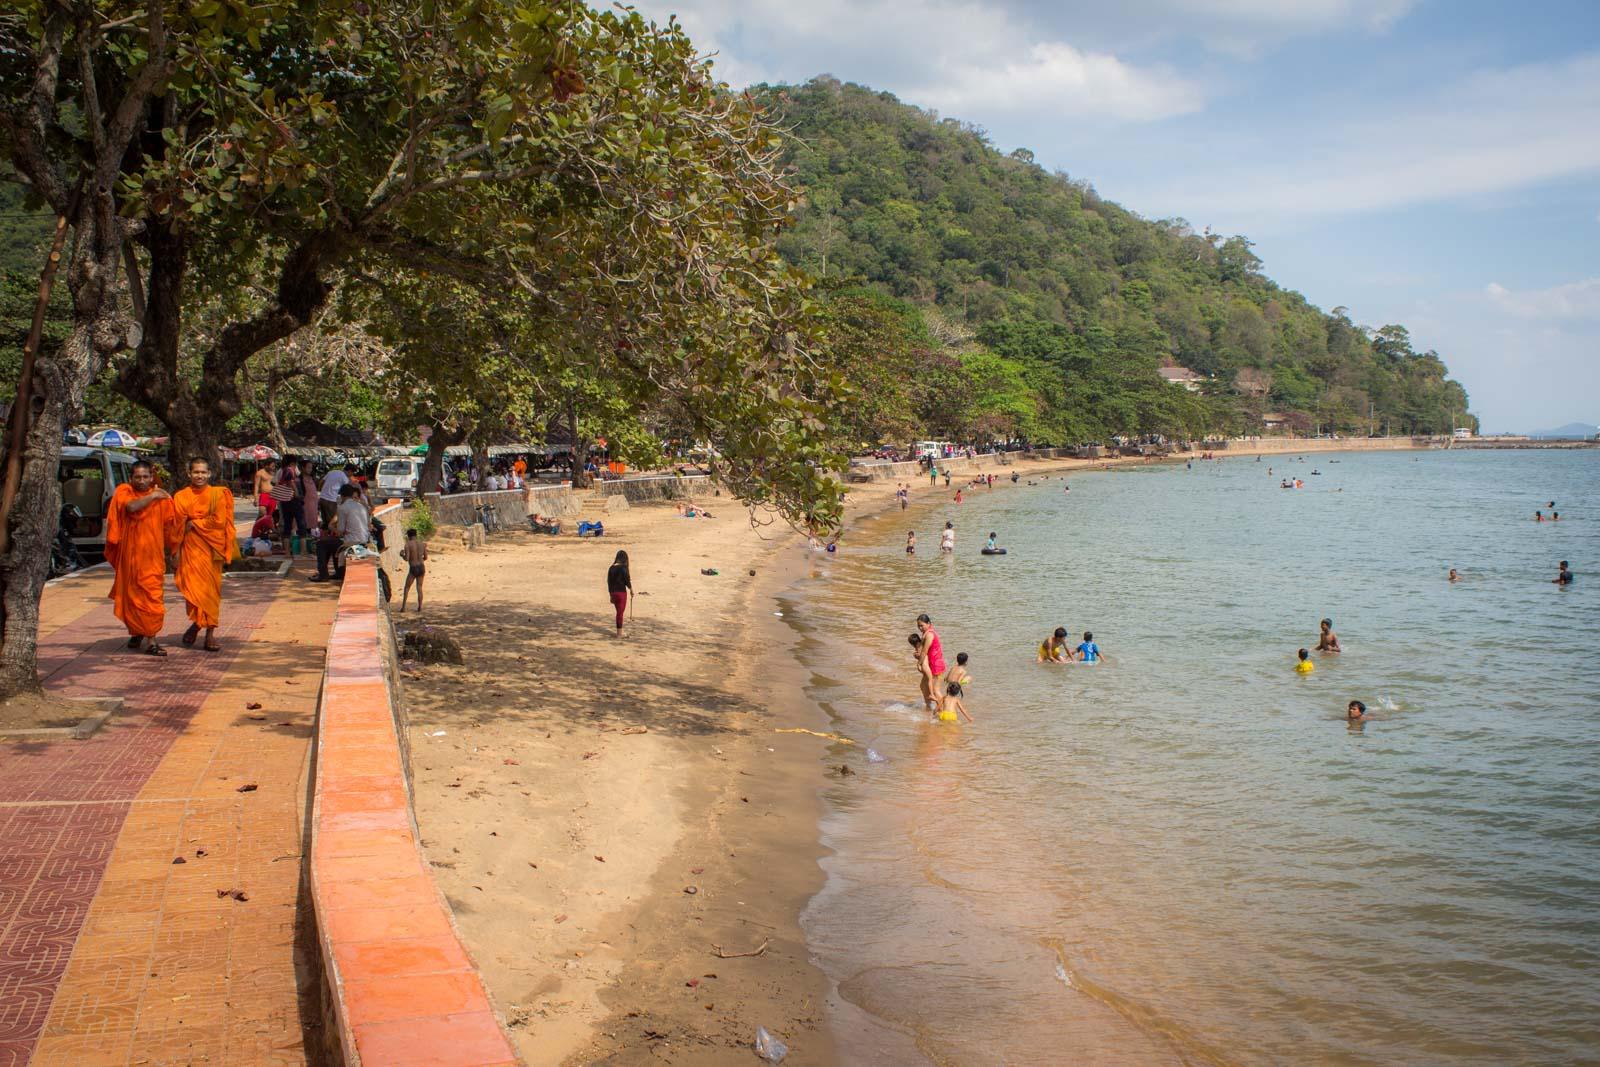 kep beach, cambodia, kep, crabs, kampot pepper, beaches in cambodia